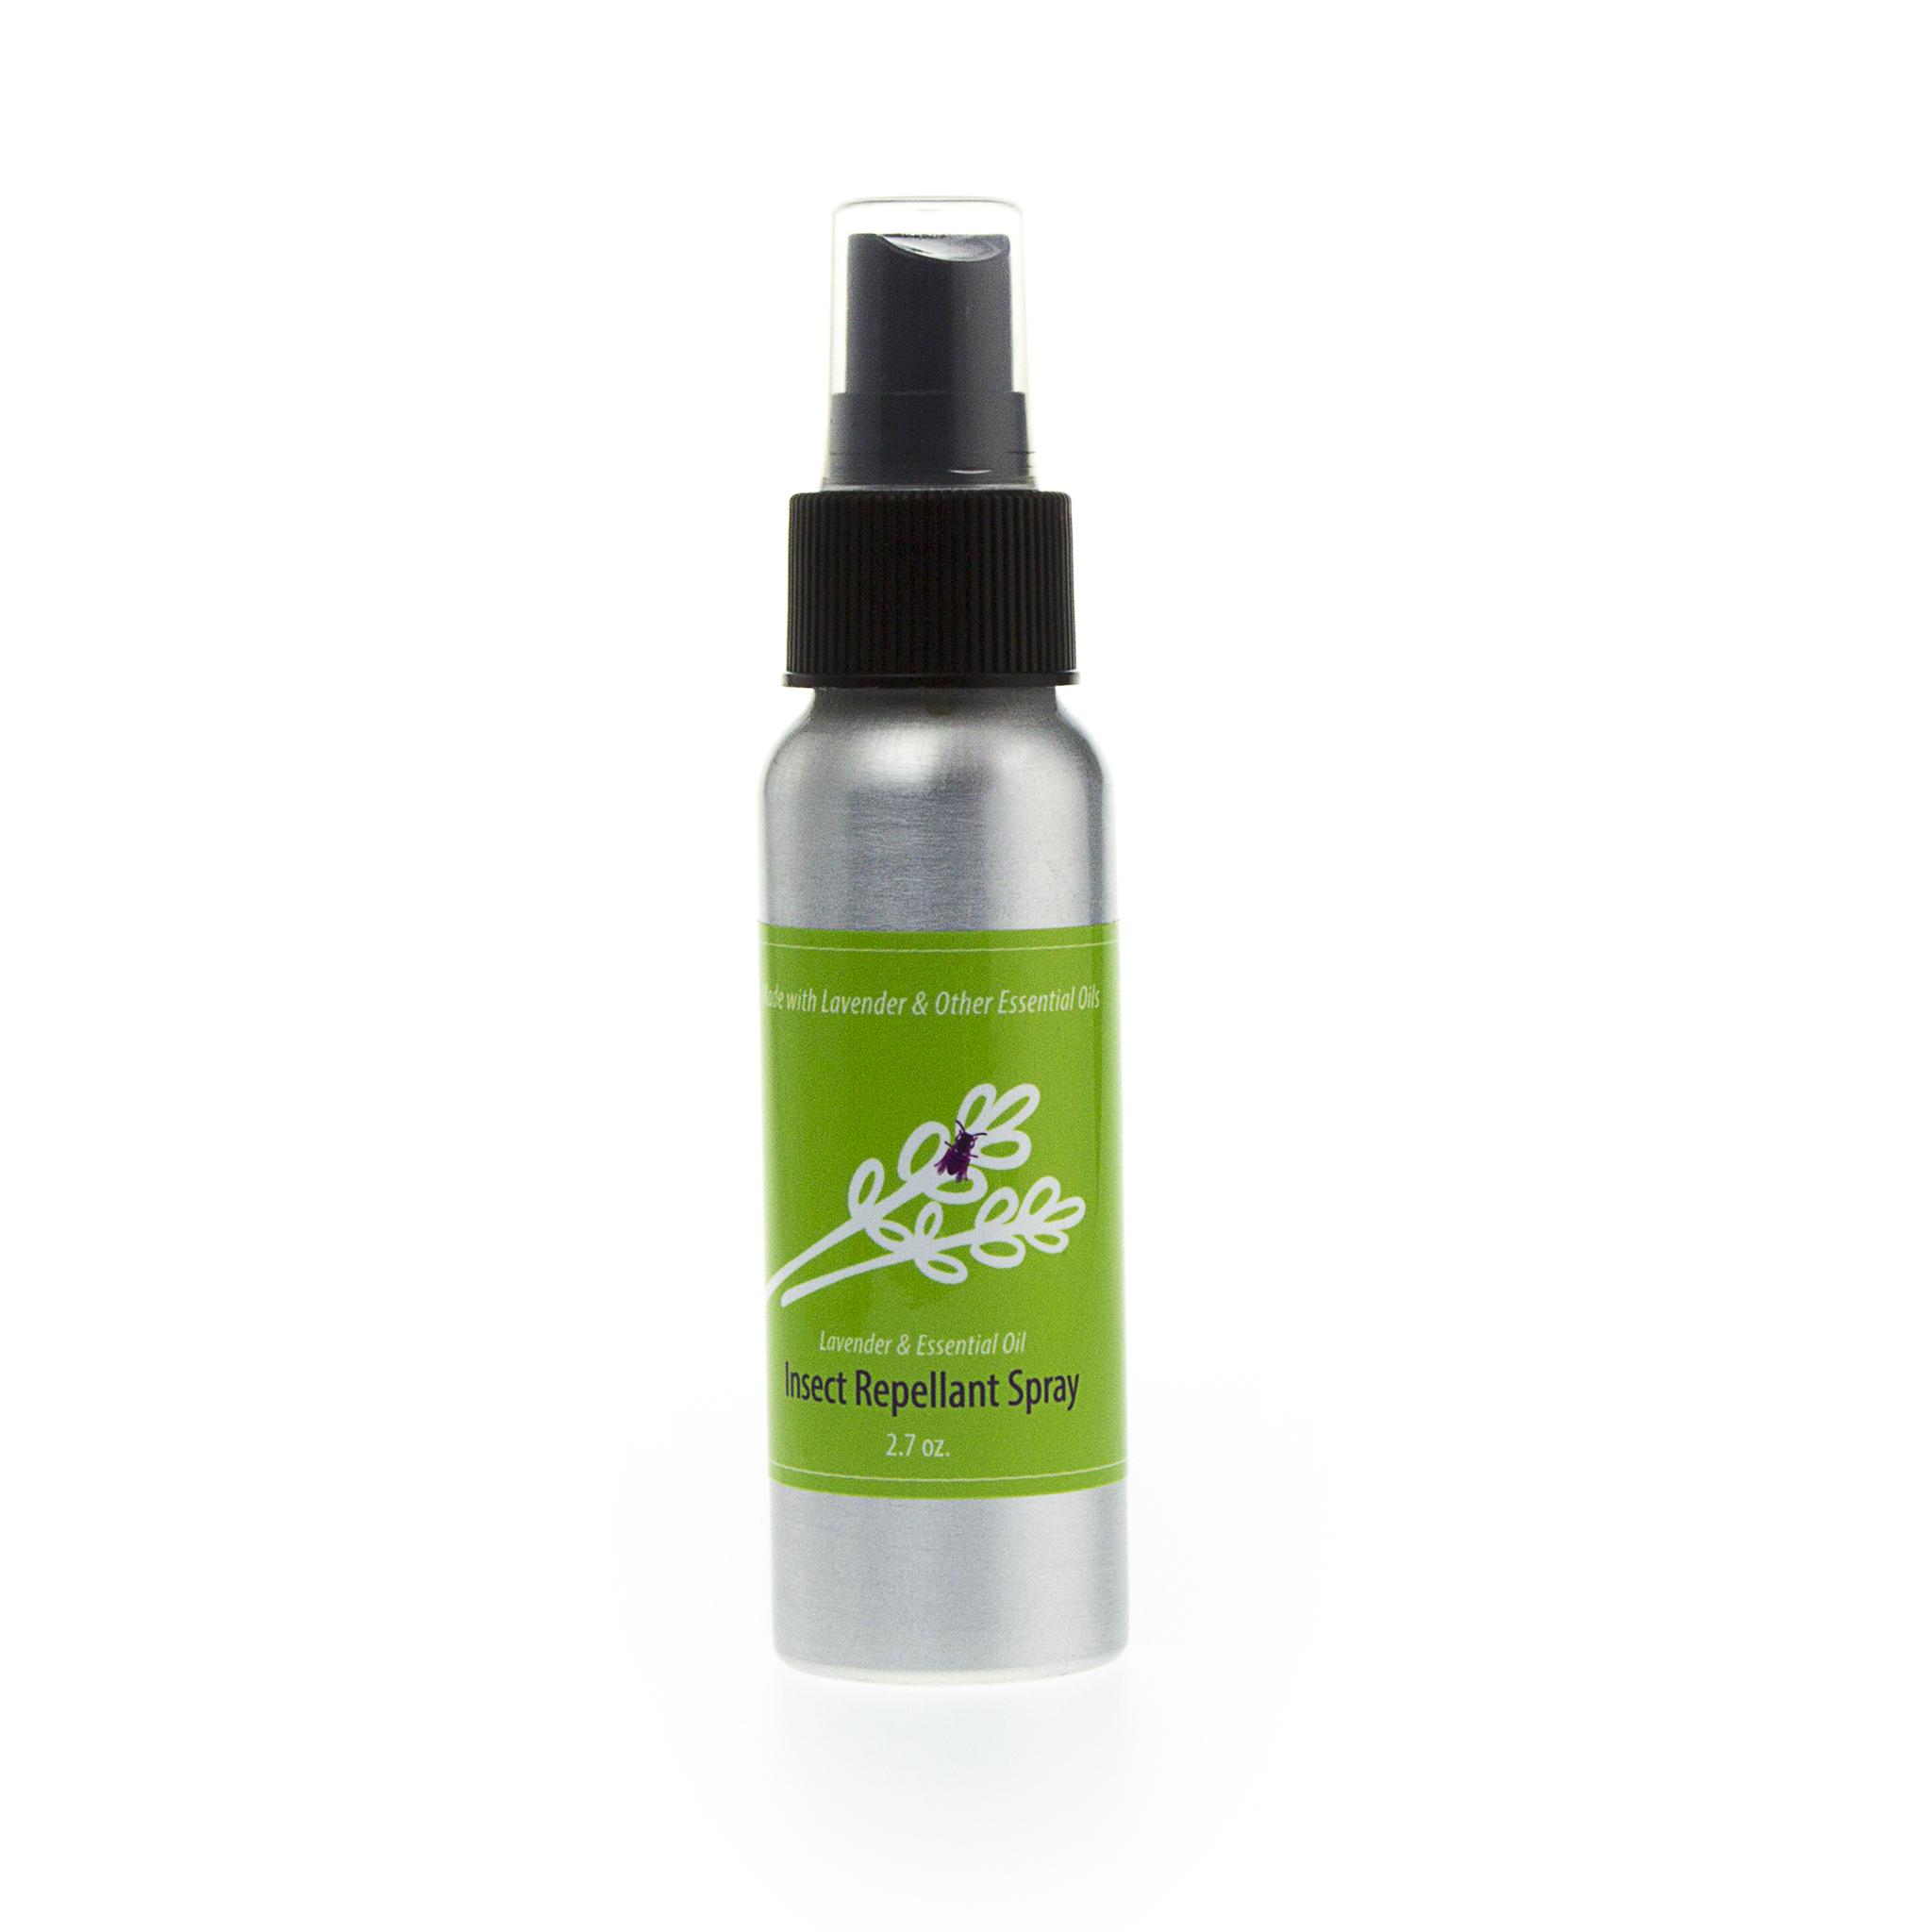 Fragrant_Isle_Insect_Repellant_Spray.jpg